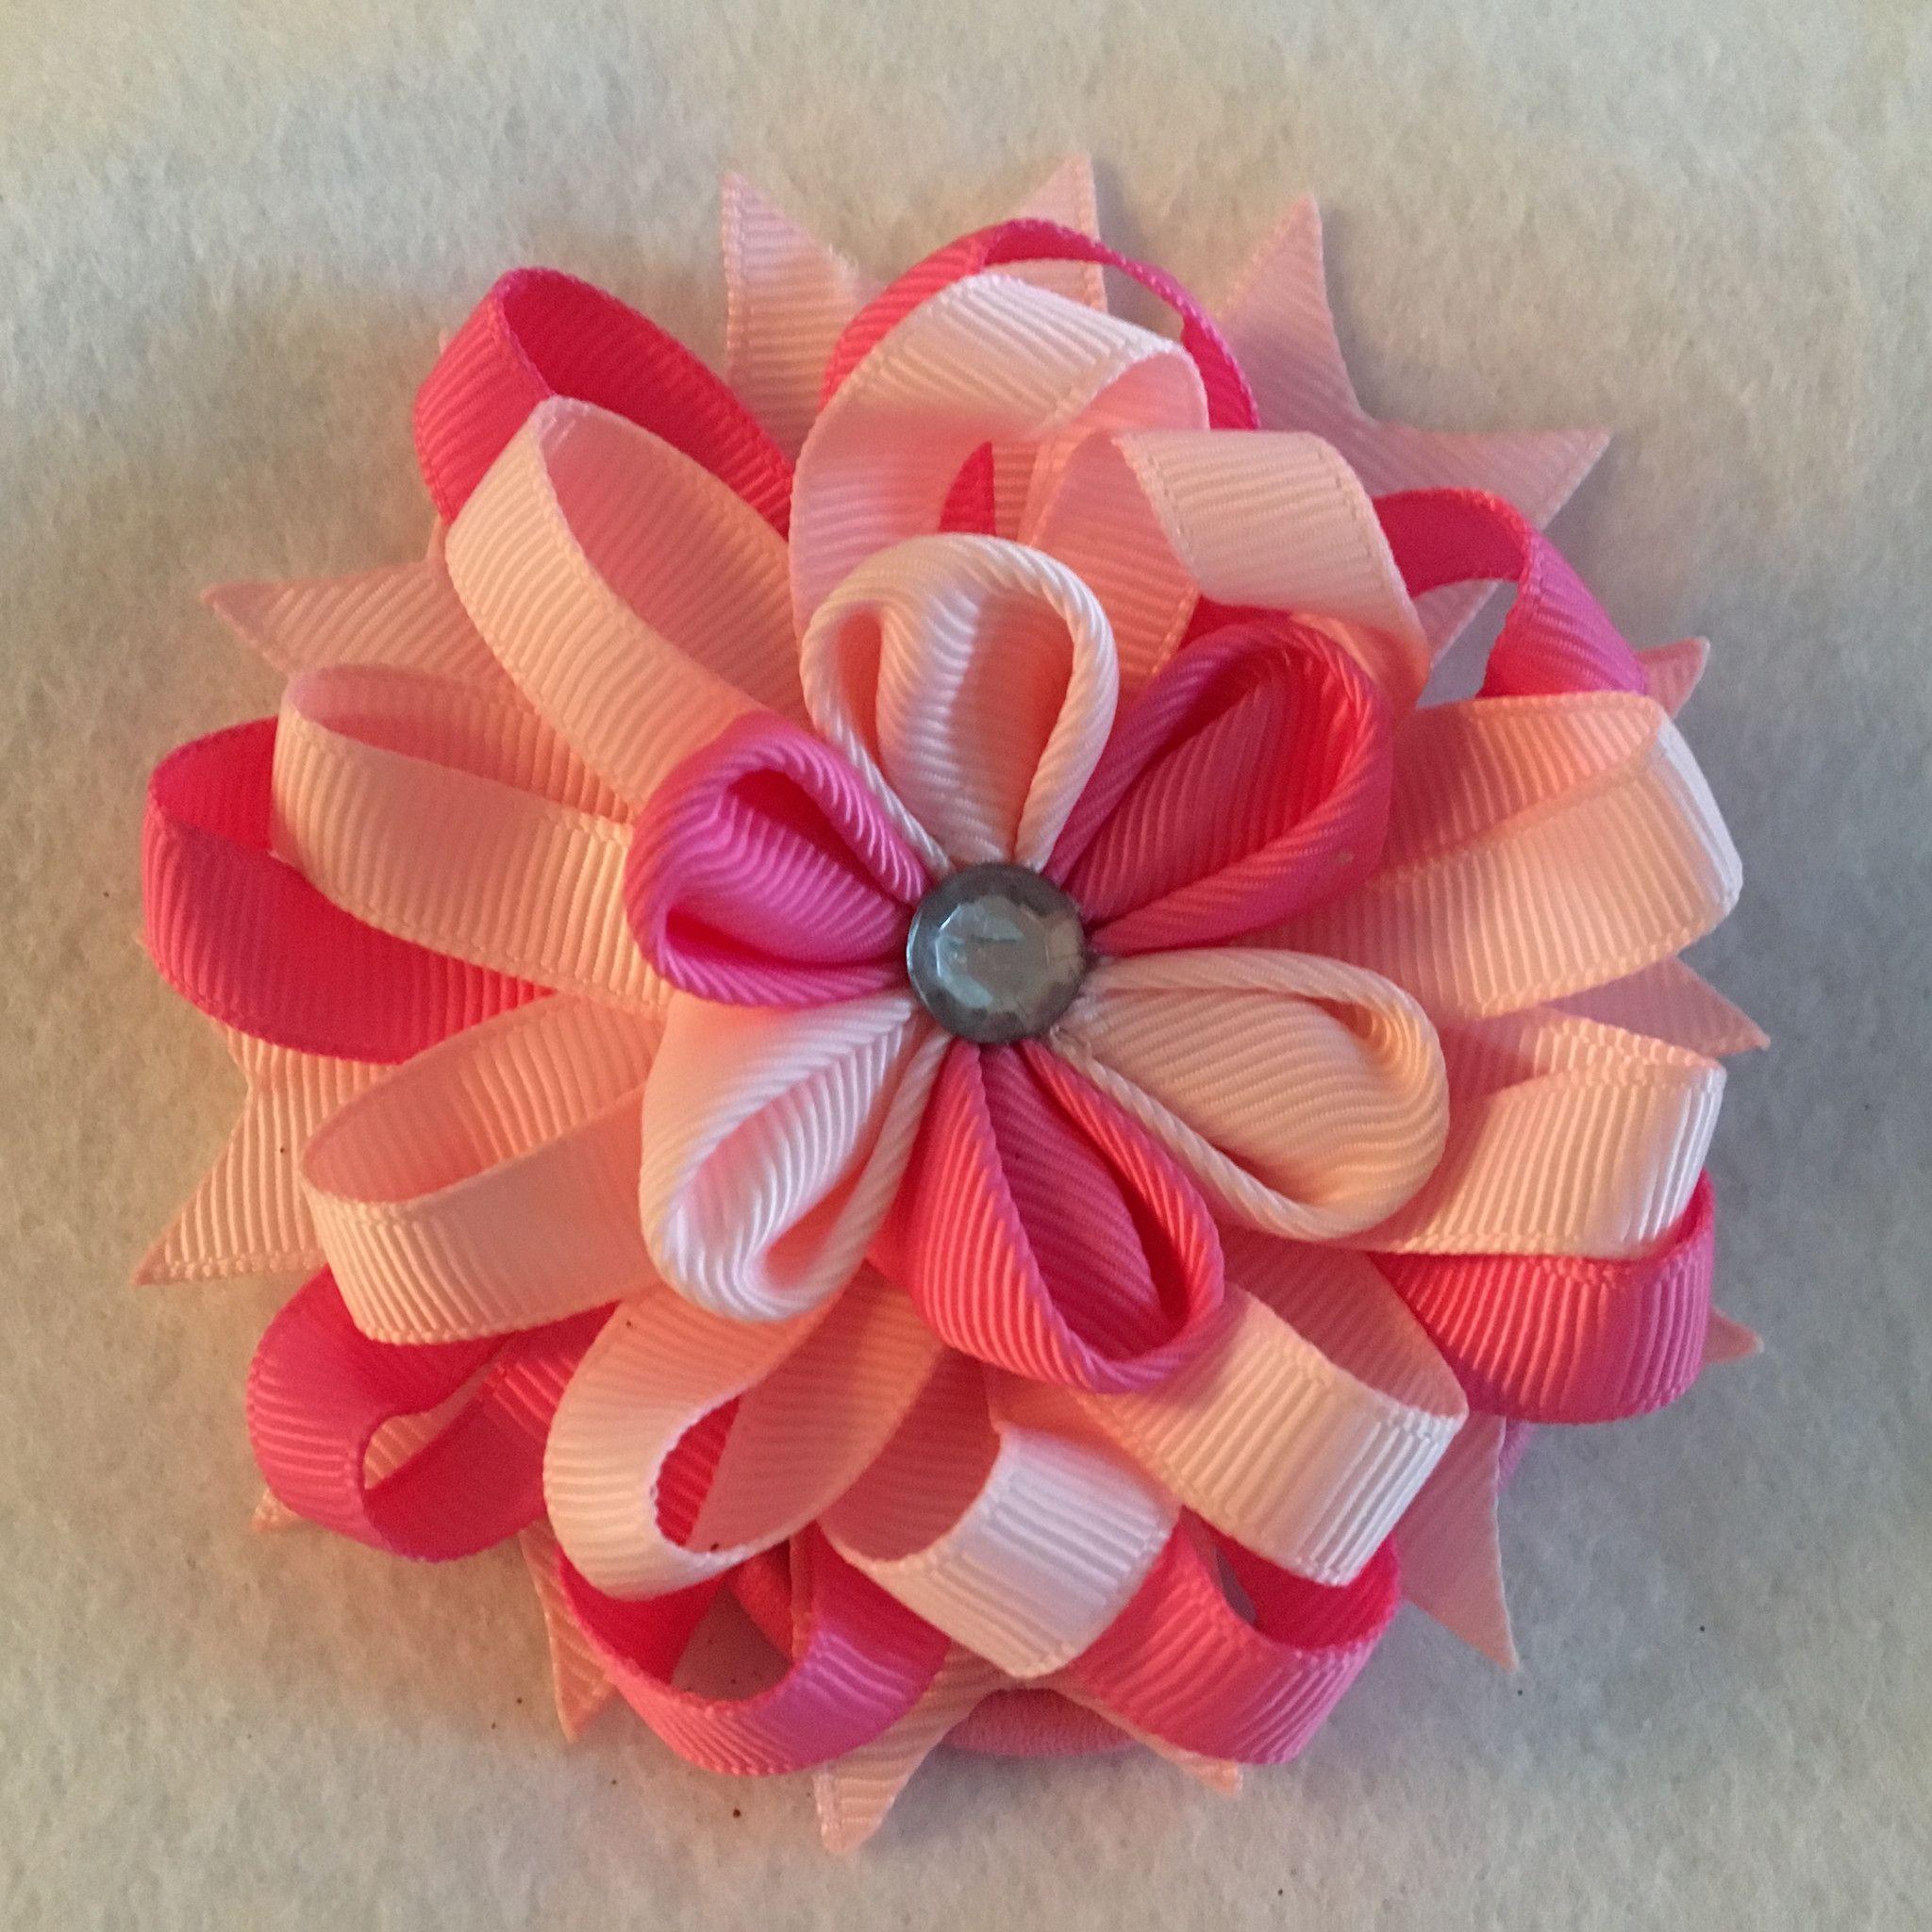 Stacked Flower, Ribbon Flower, Ponytail Holder, Flower Ponytail Holder, Stacked Flower Ponytail Holder, Kanzashi Flower